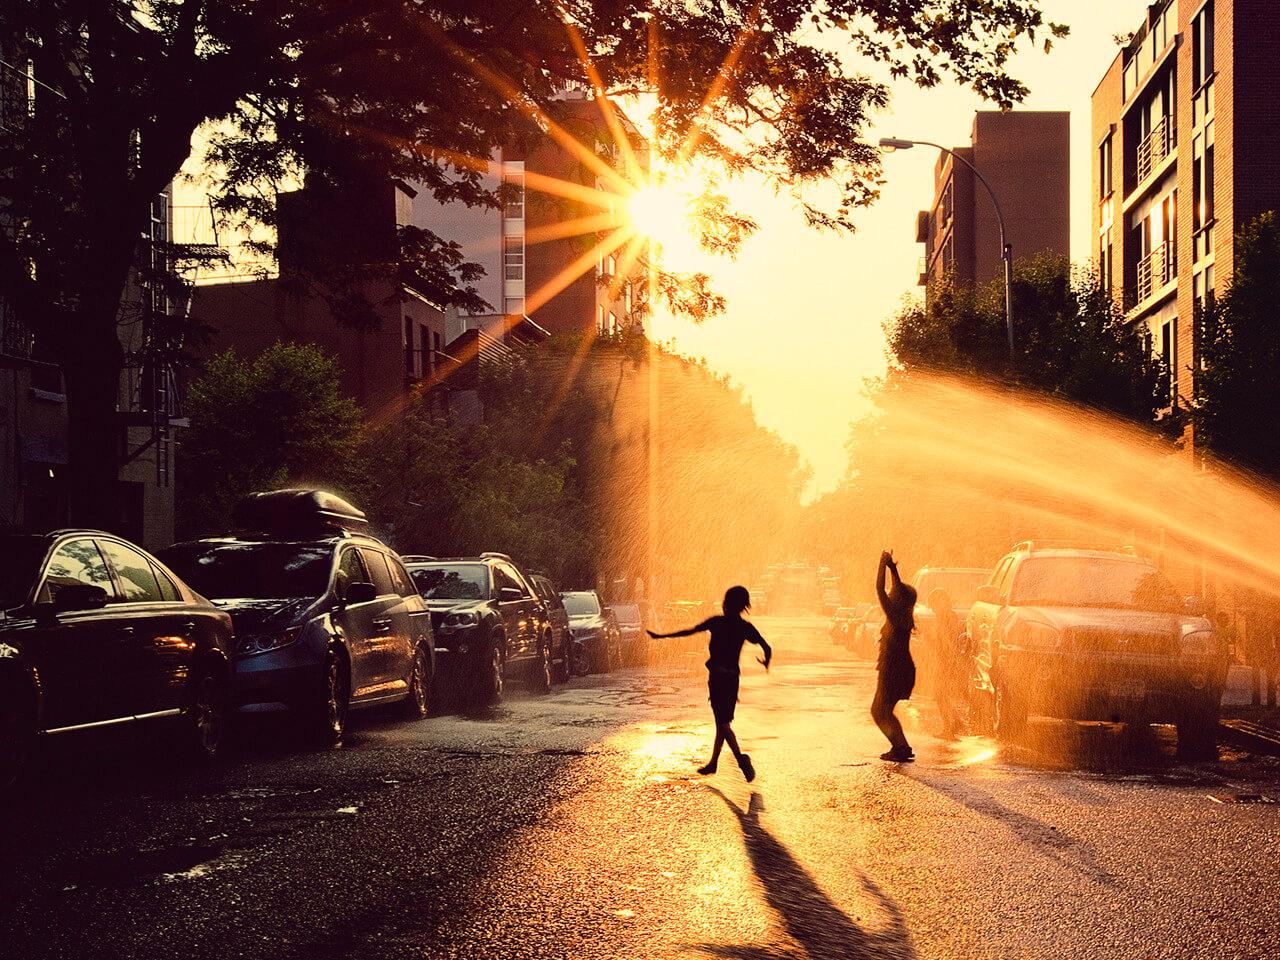 heat in the city - Urban Heat Islands